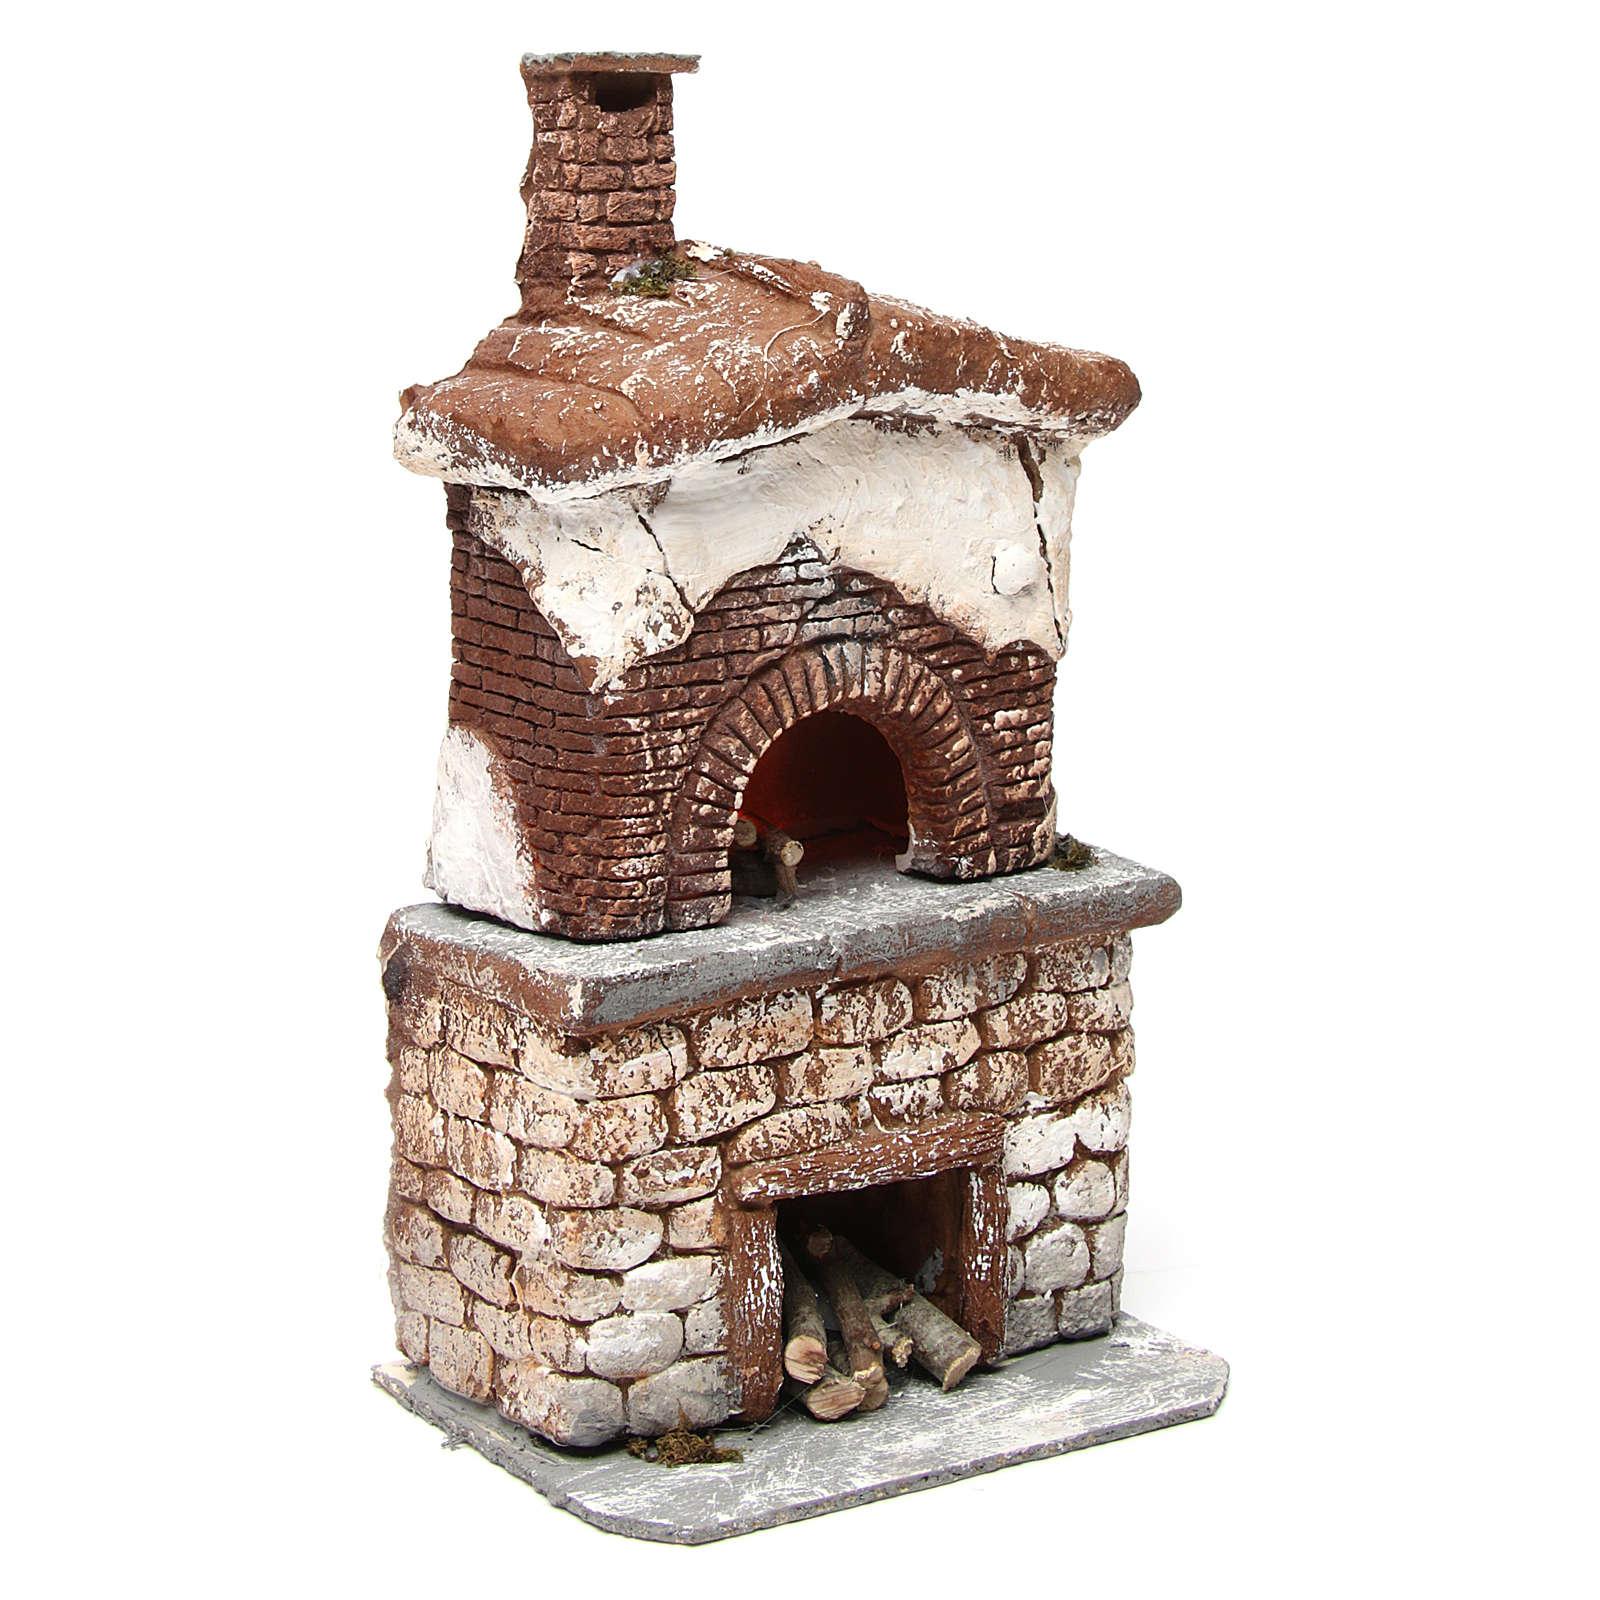 Oven with light in resin for Neapolitan Nativity Scene 30x15x10 cm 4